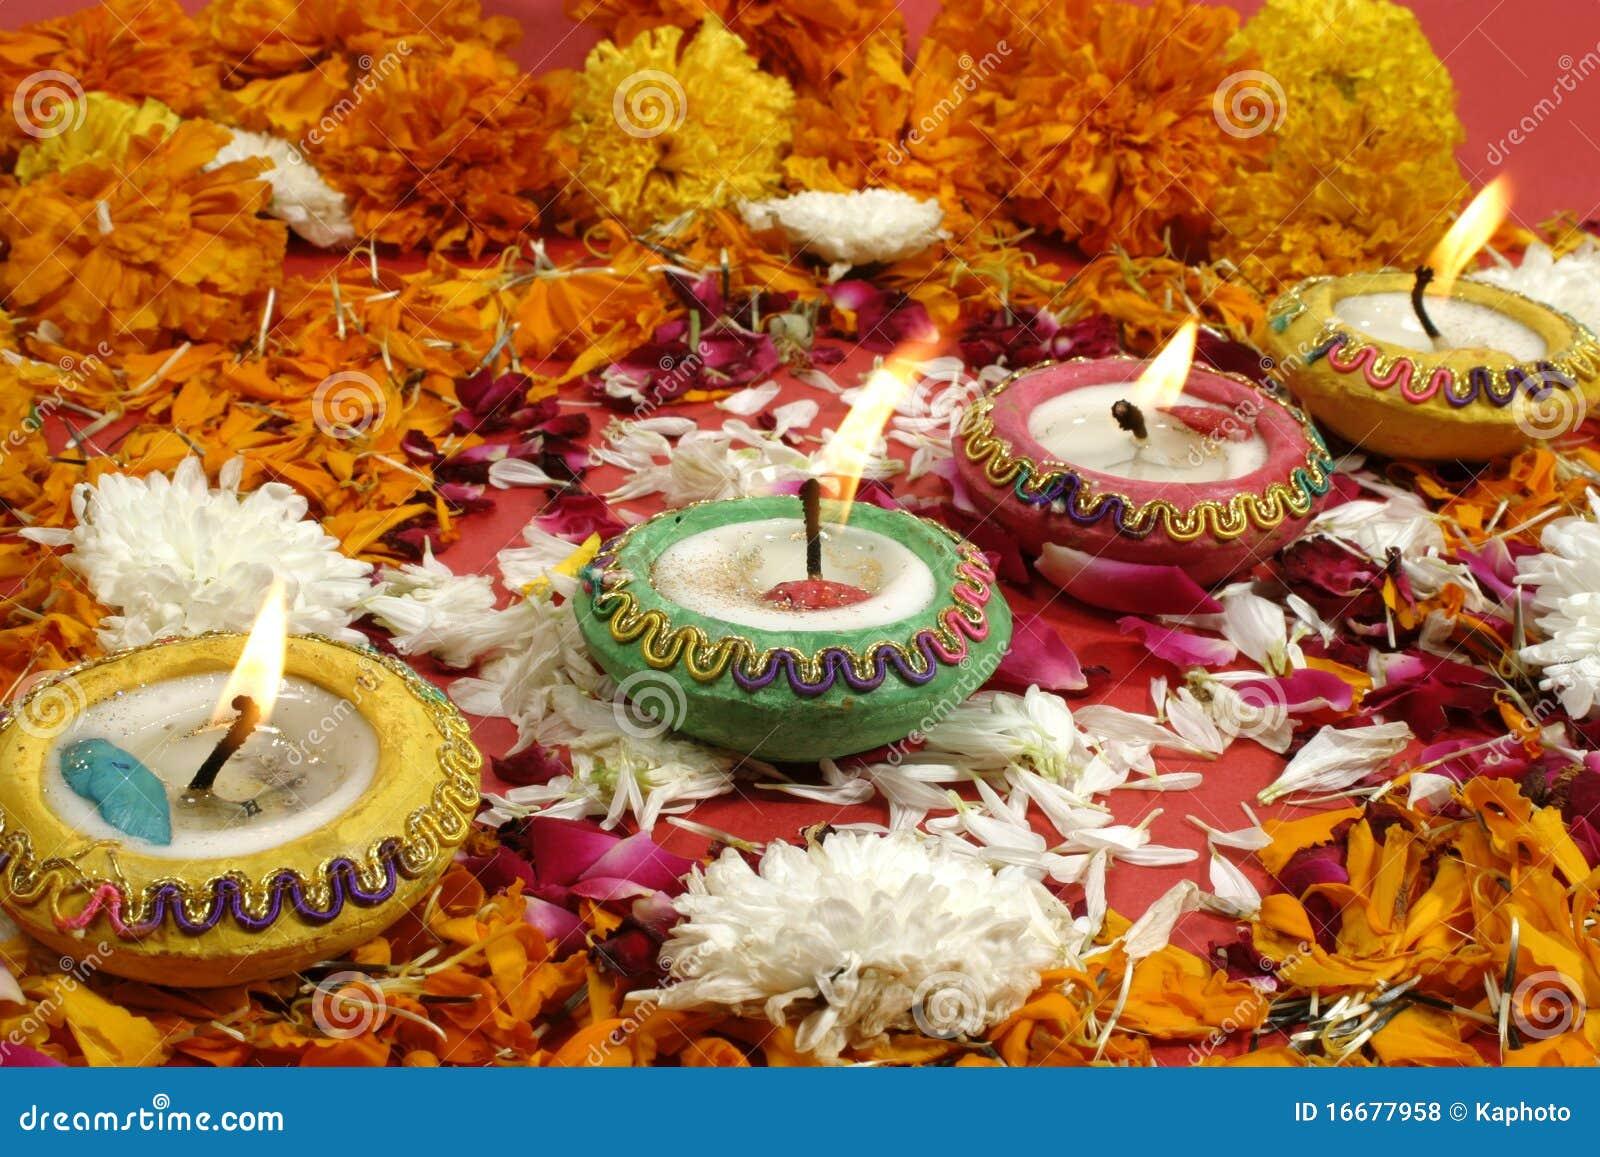 Diwali, Festival of lights